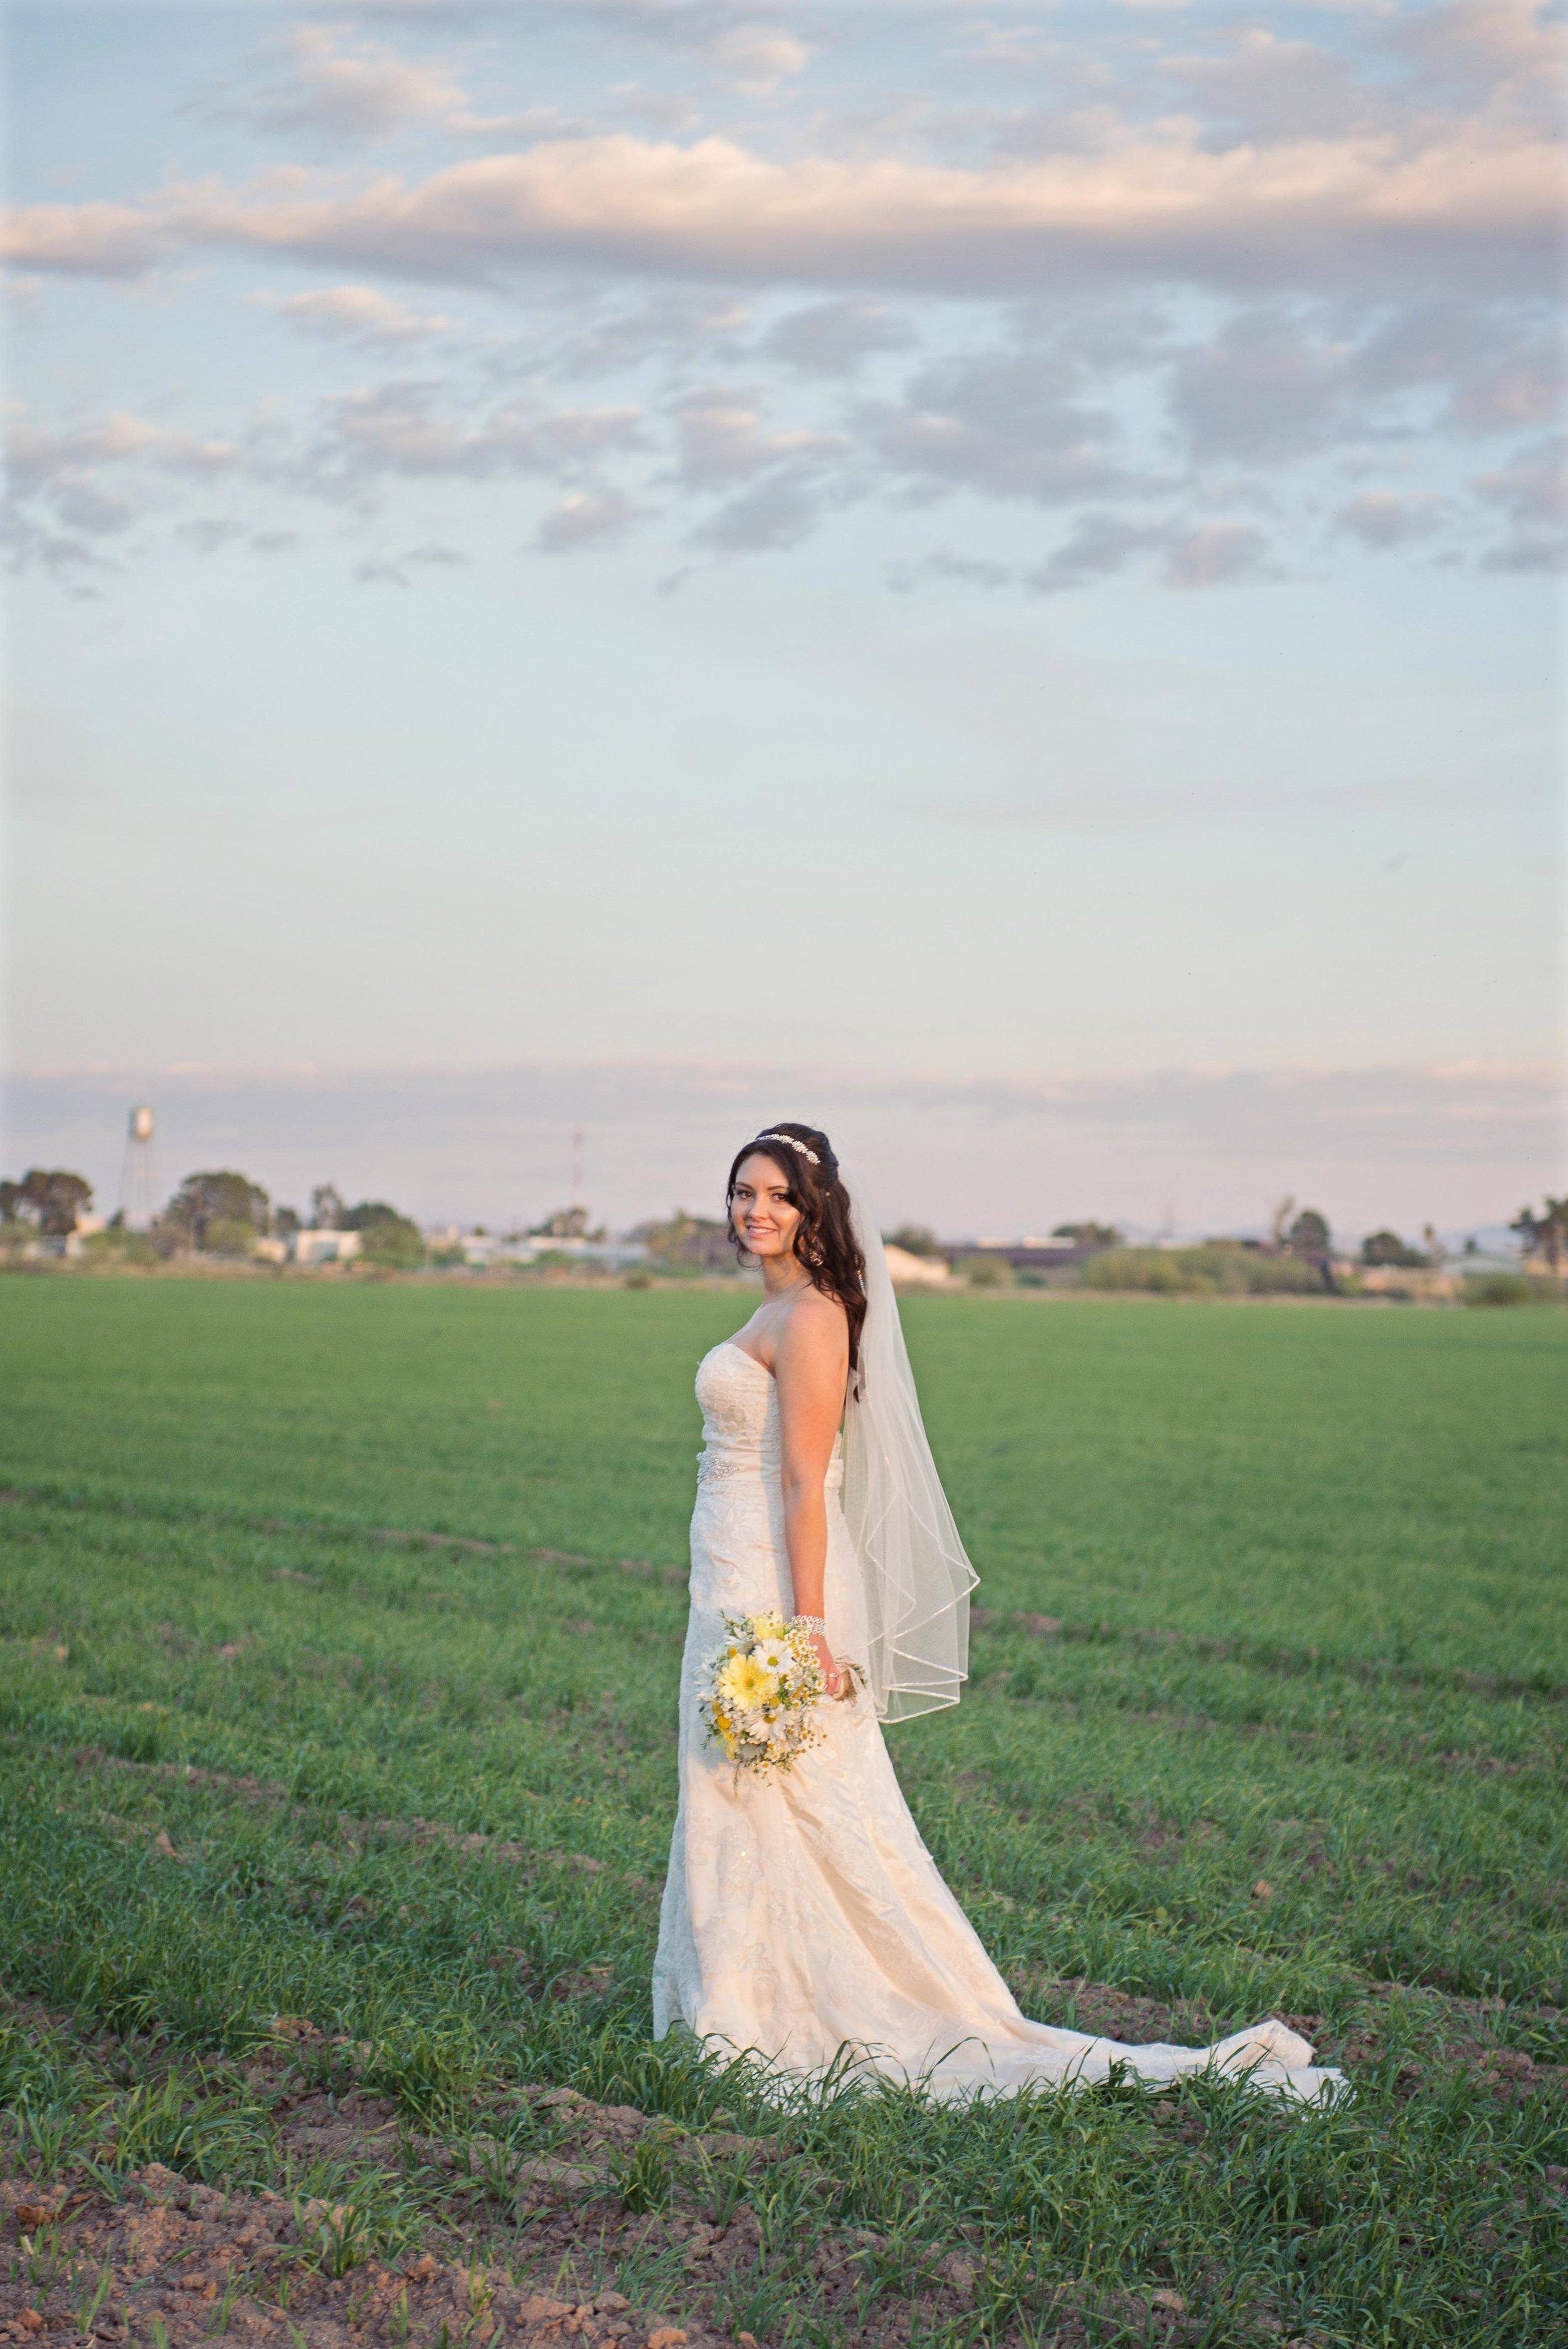 weddingwebsitesmallerpics-127.jpg